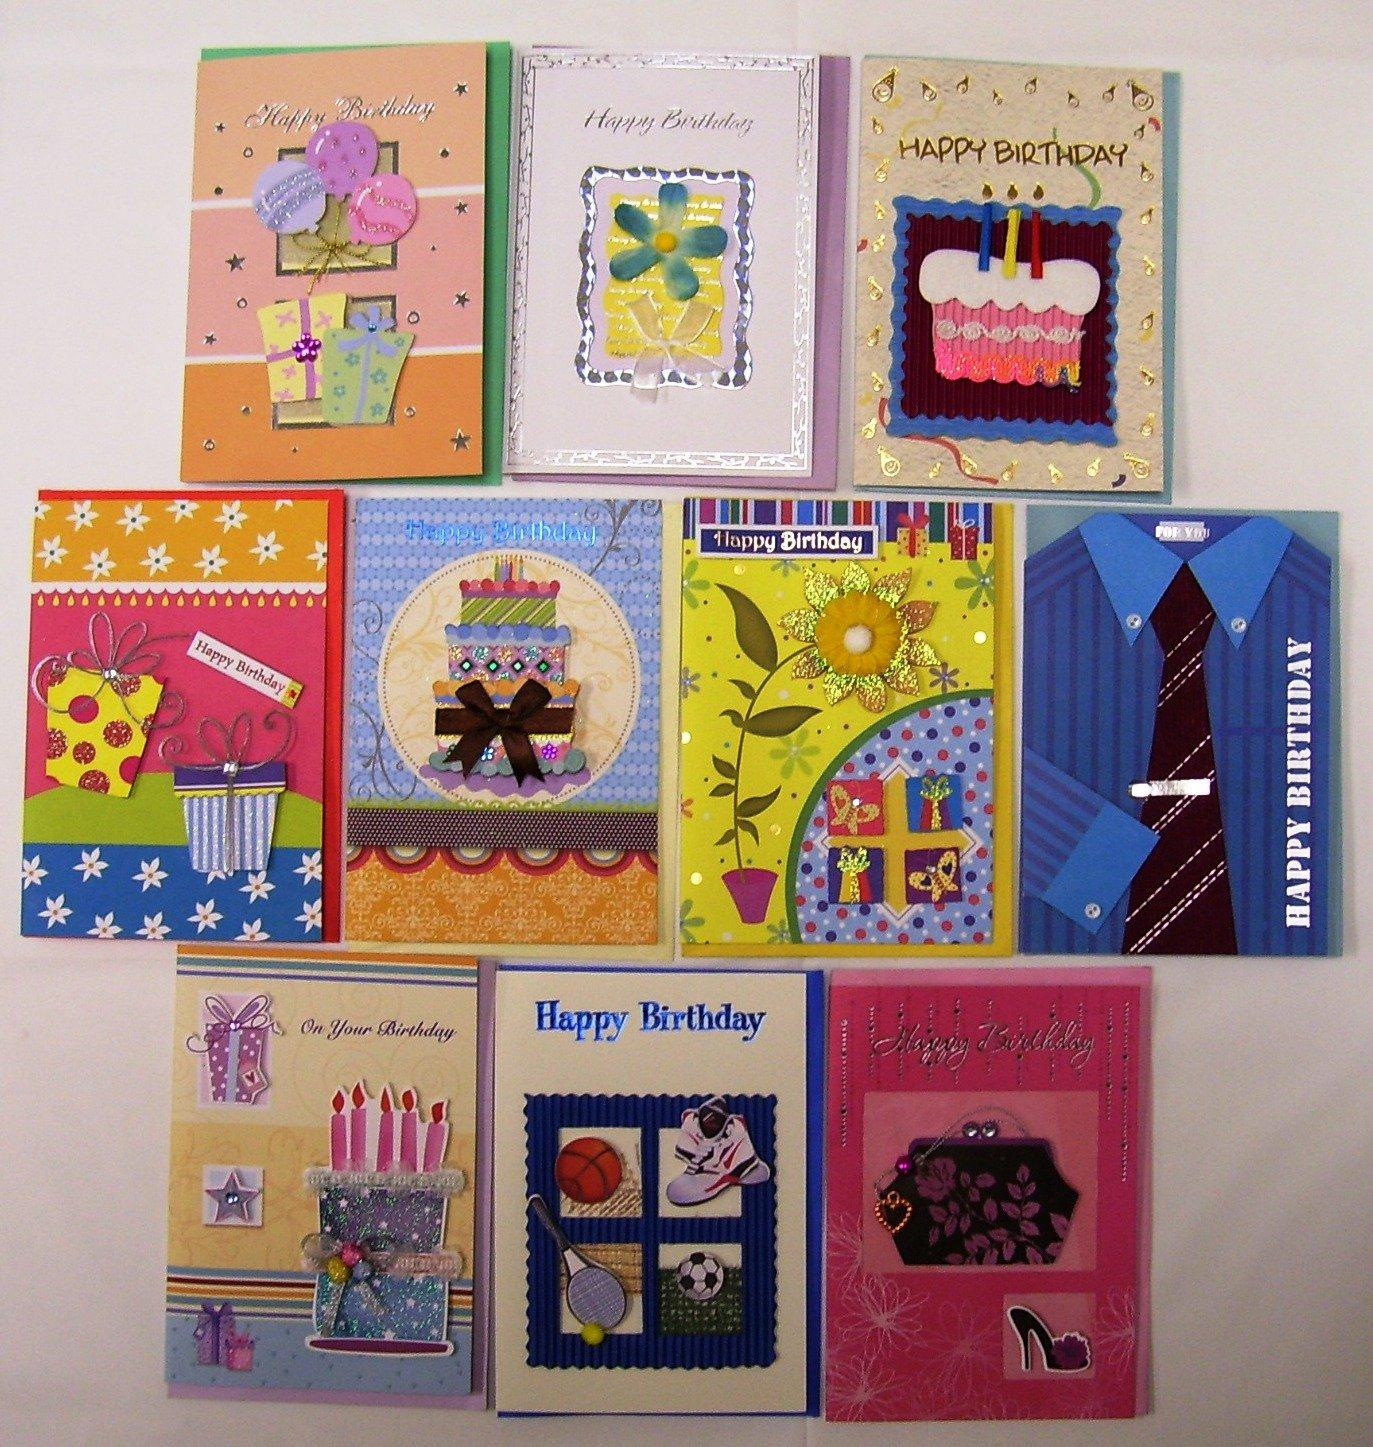 Amazon Deluxe Handmade Birthday Greeting Cards 10 Pack – Handmade Greeting Cards for Birthday